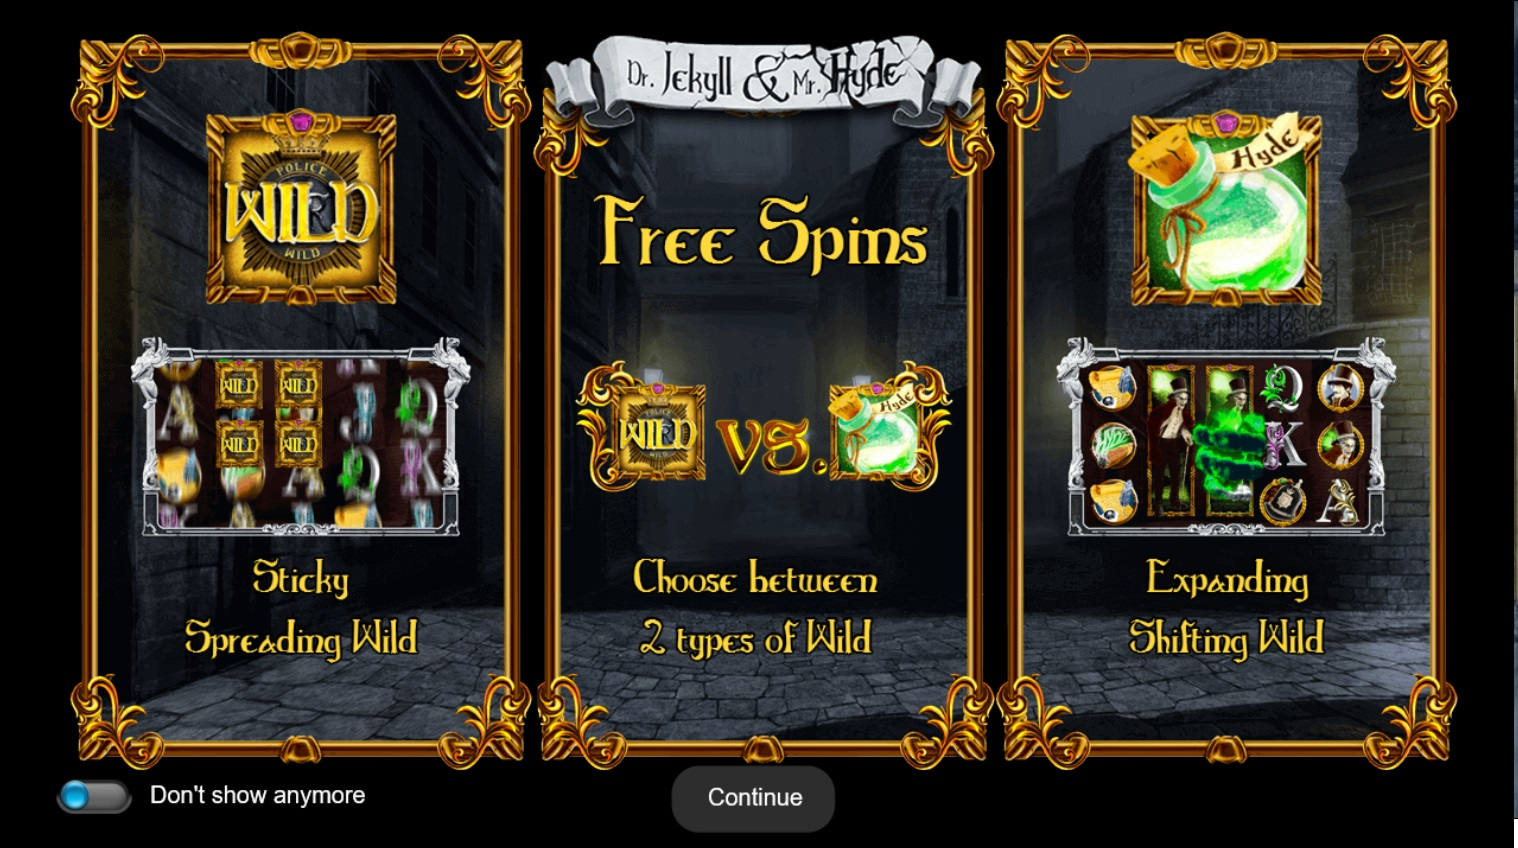 Игровой автомат Dr Jekyll And Mr Hyde